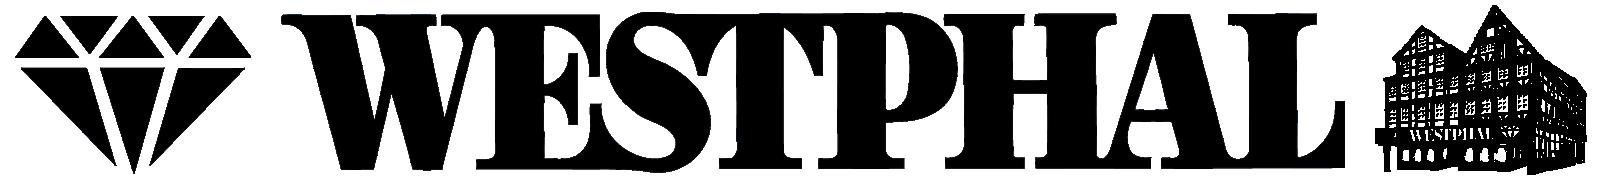 Juwelier Westphal in Peine Retina Logo